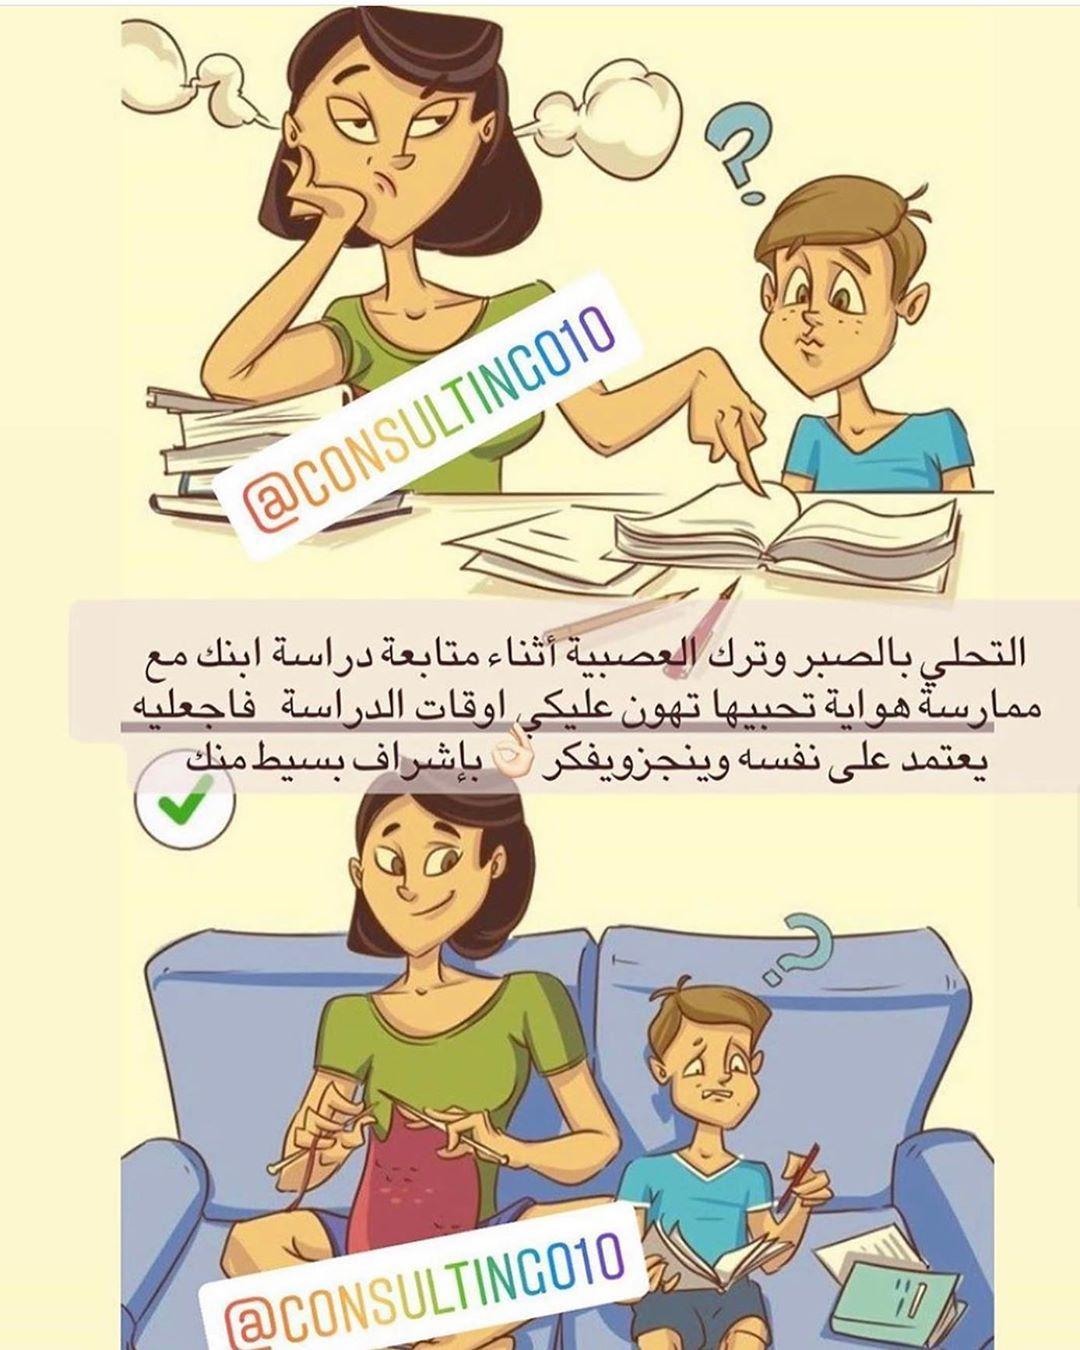 34 Likes 4 Comments Ebda3at 2 Share On Instagram بعد ما افهمه واشرحله المطلوب بطلب منه يحل وانا شوي اشغل نفسي عنه م Childrens Education Character Kids